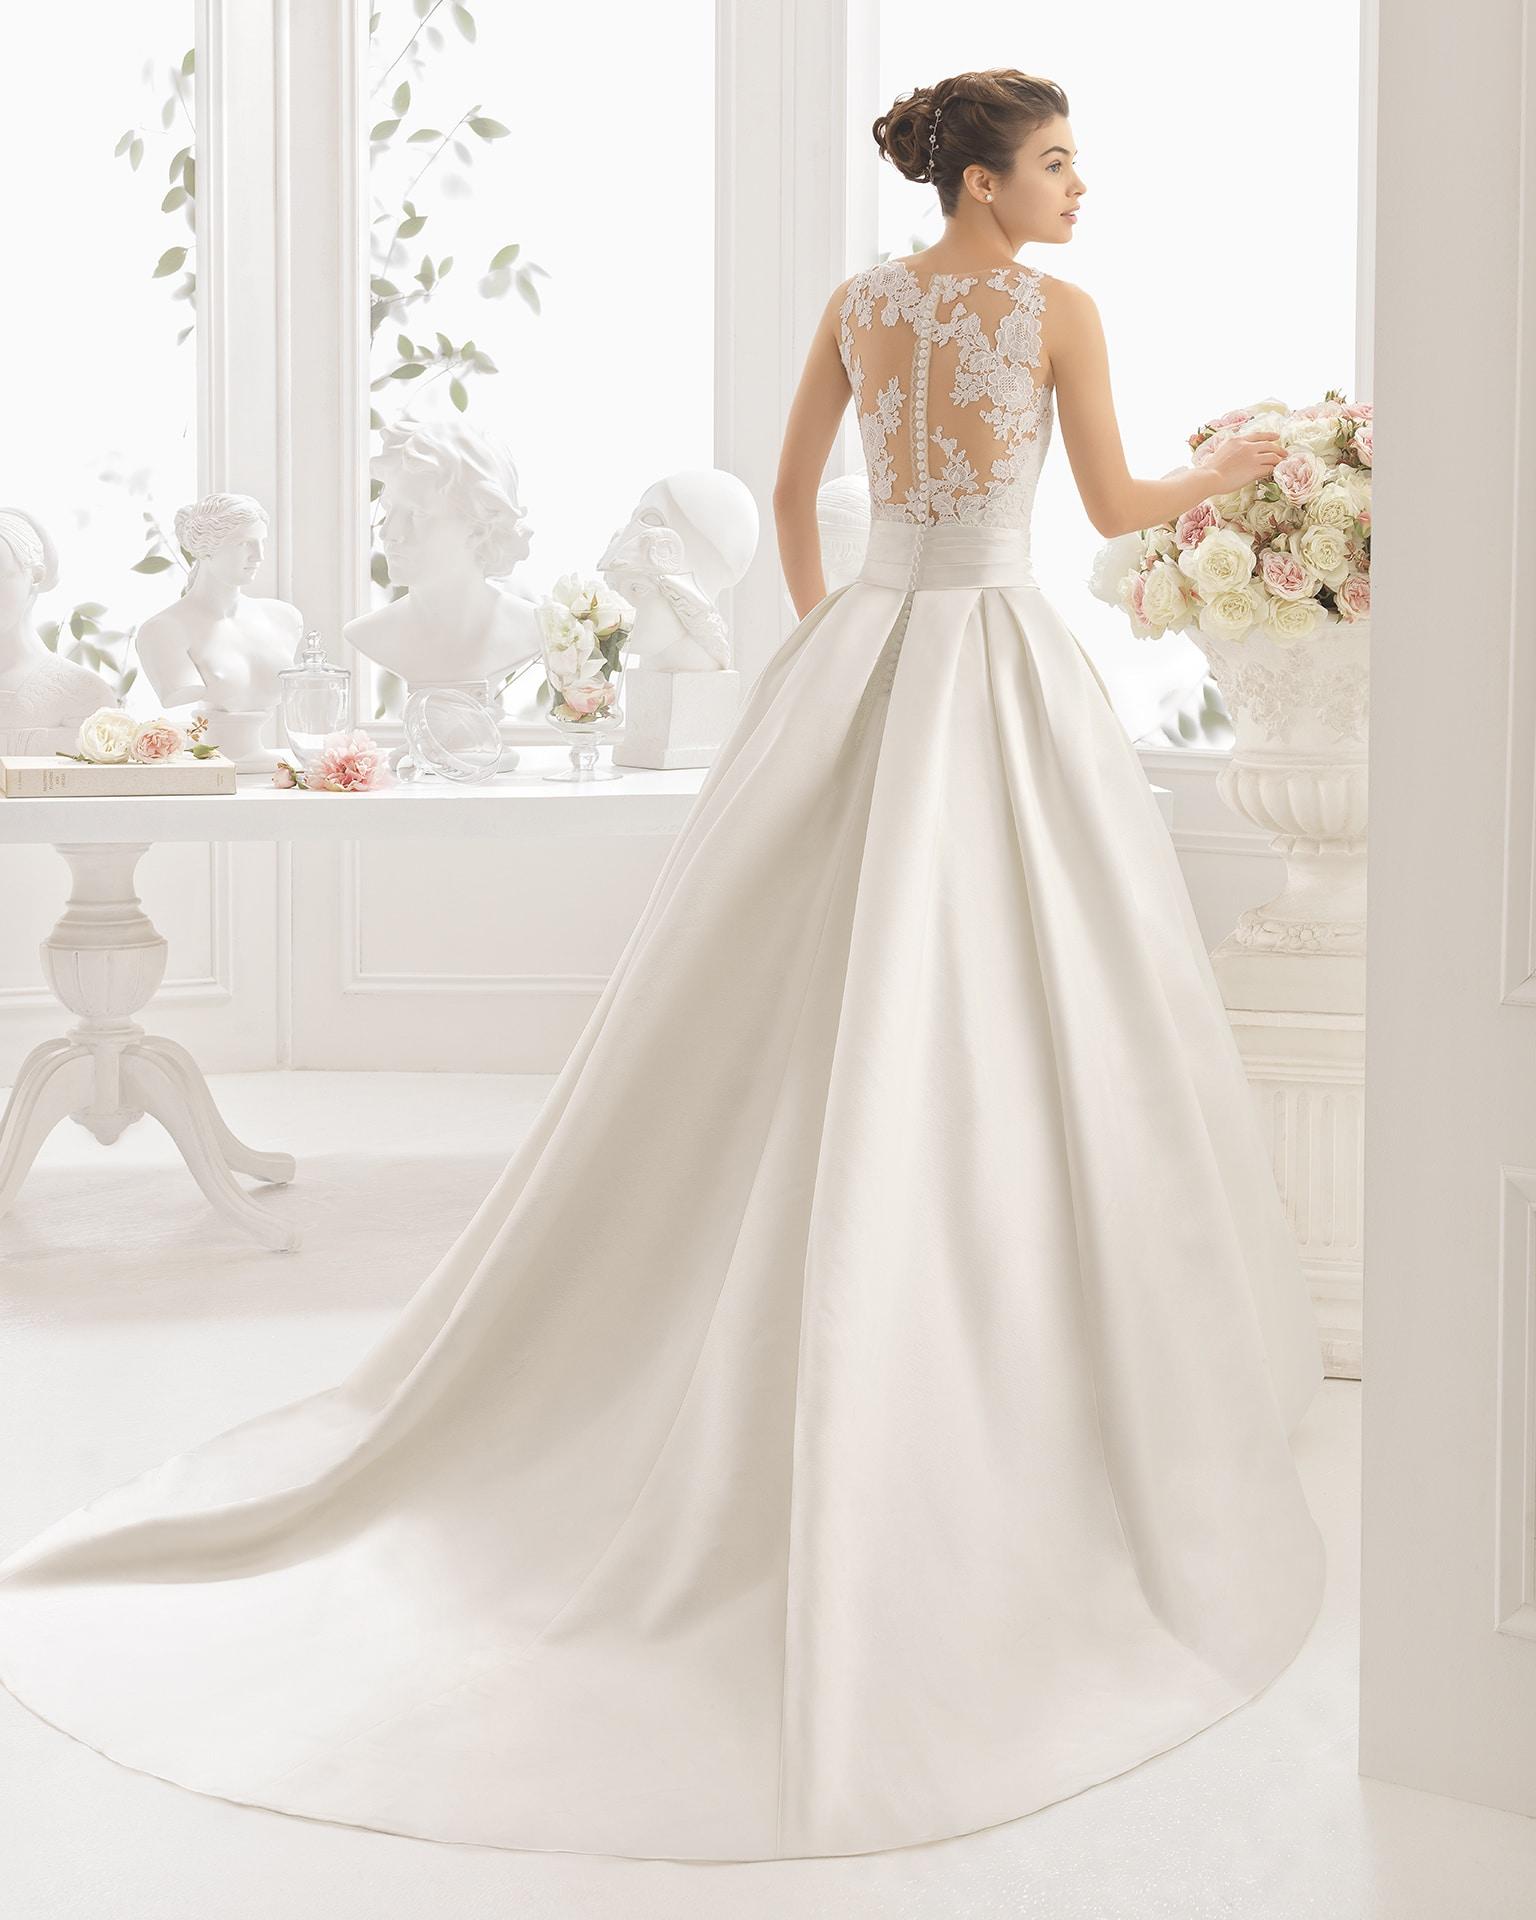 Cira Wedding Dress Aire Barcelona Boutique Paris